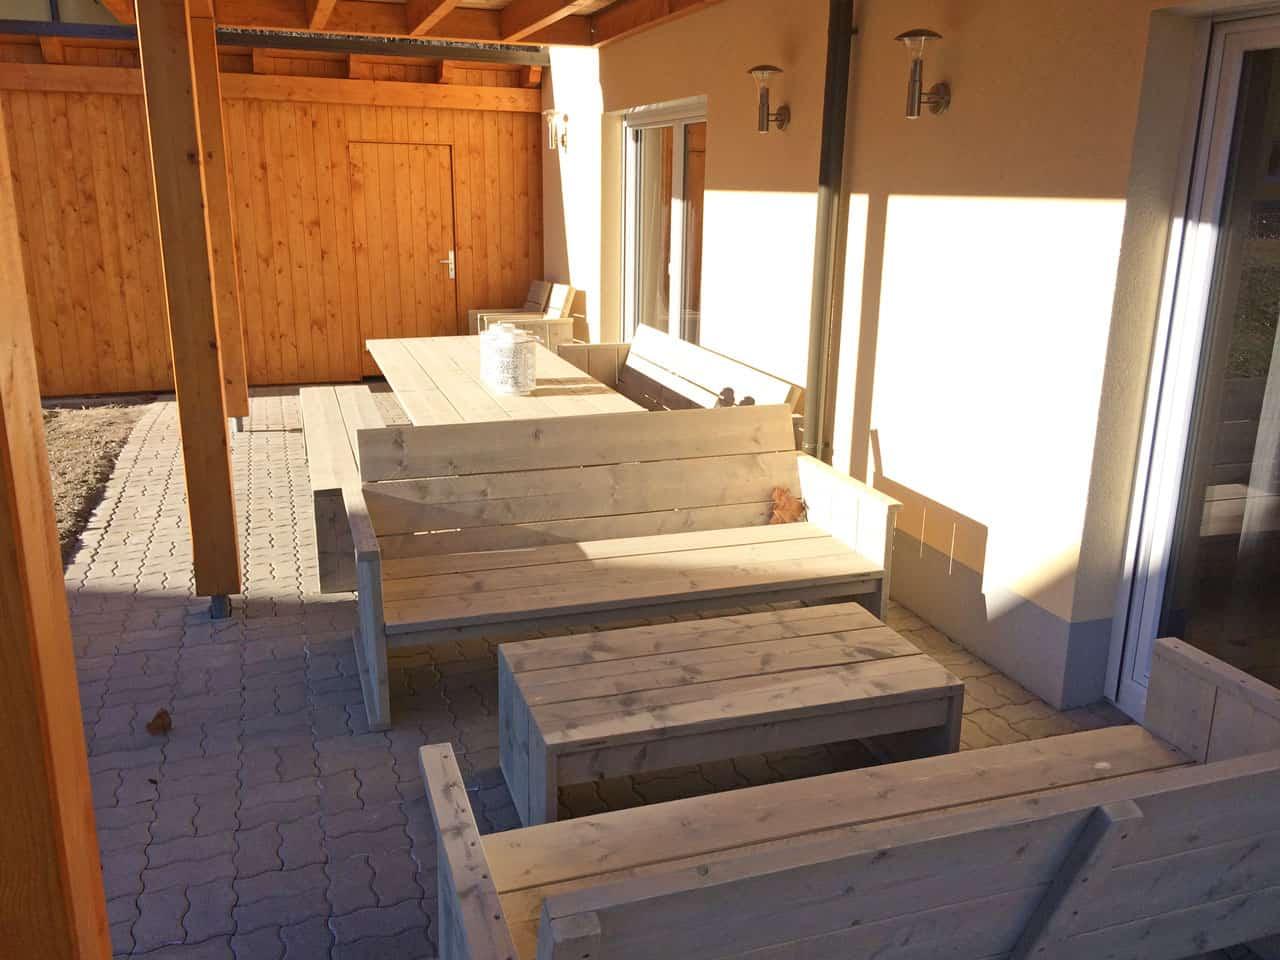 KWO-villa-villa-alpenrose-04-gezellige-eettafel-en-lounge-banken-0692